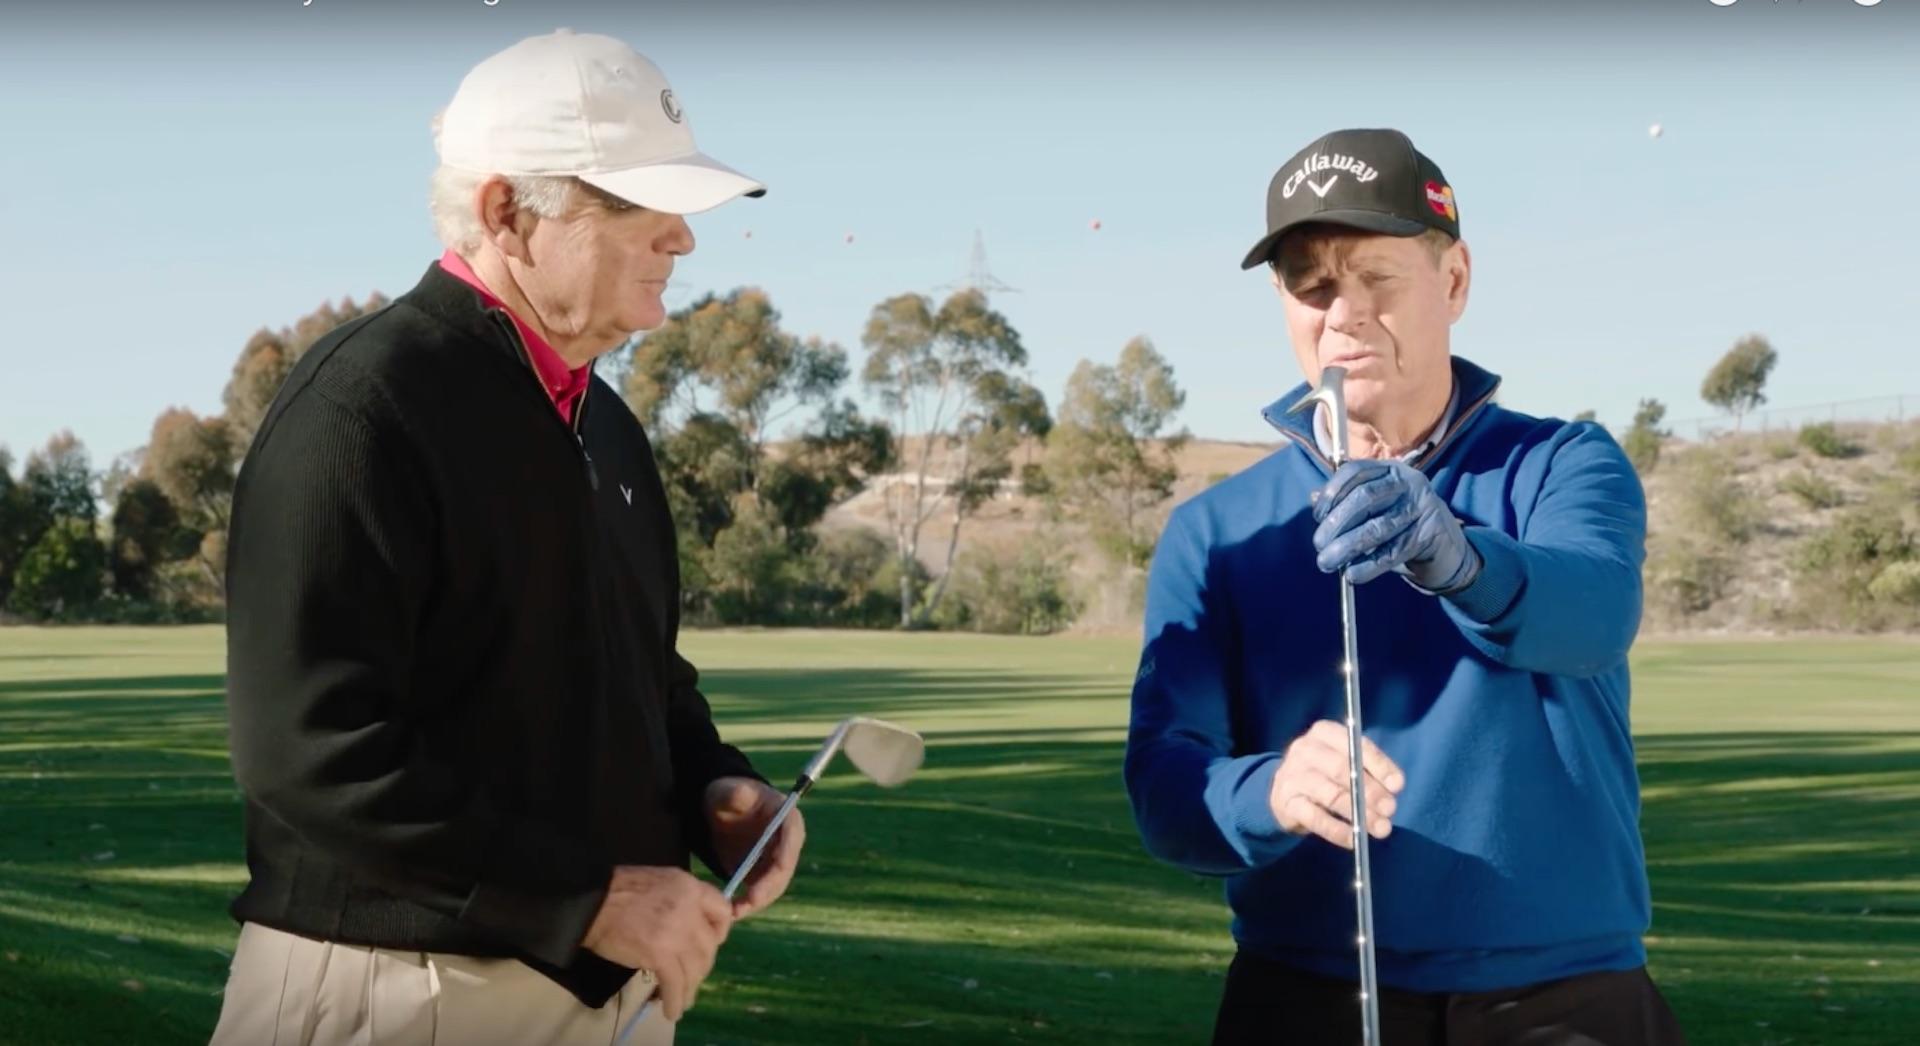 GolfPunk teams up with Virgin Golf Swingers